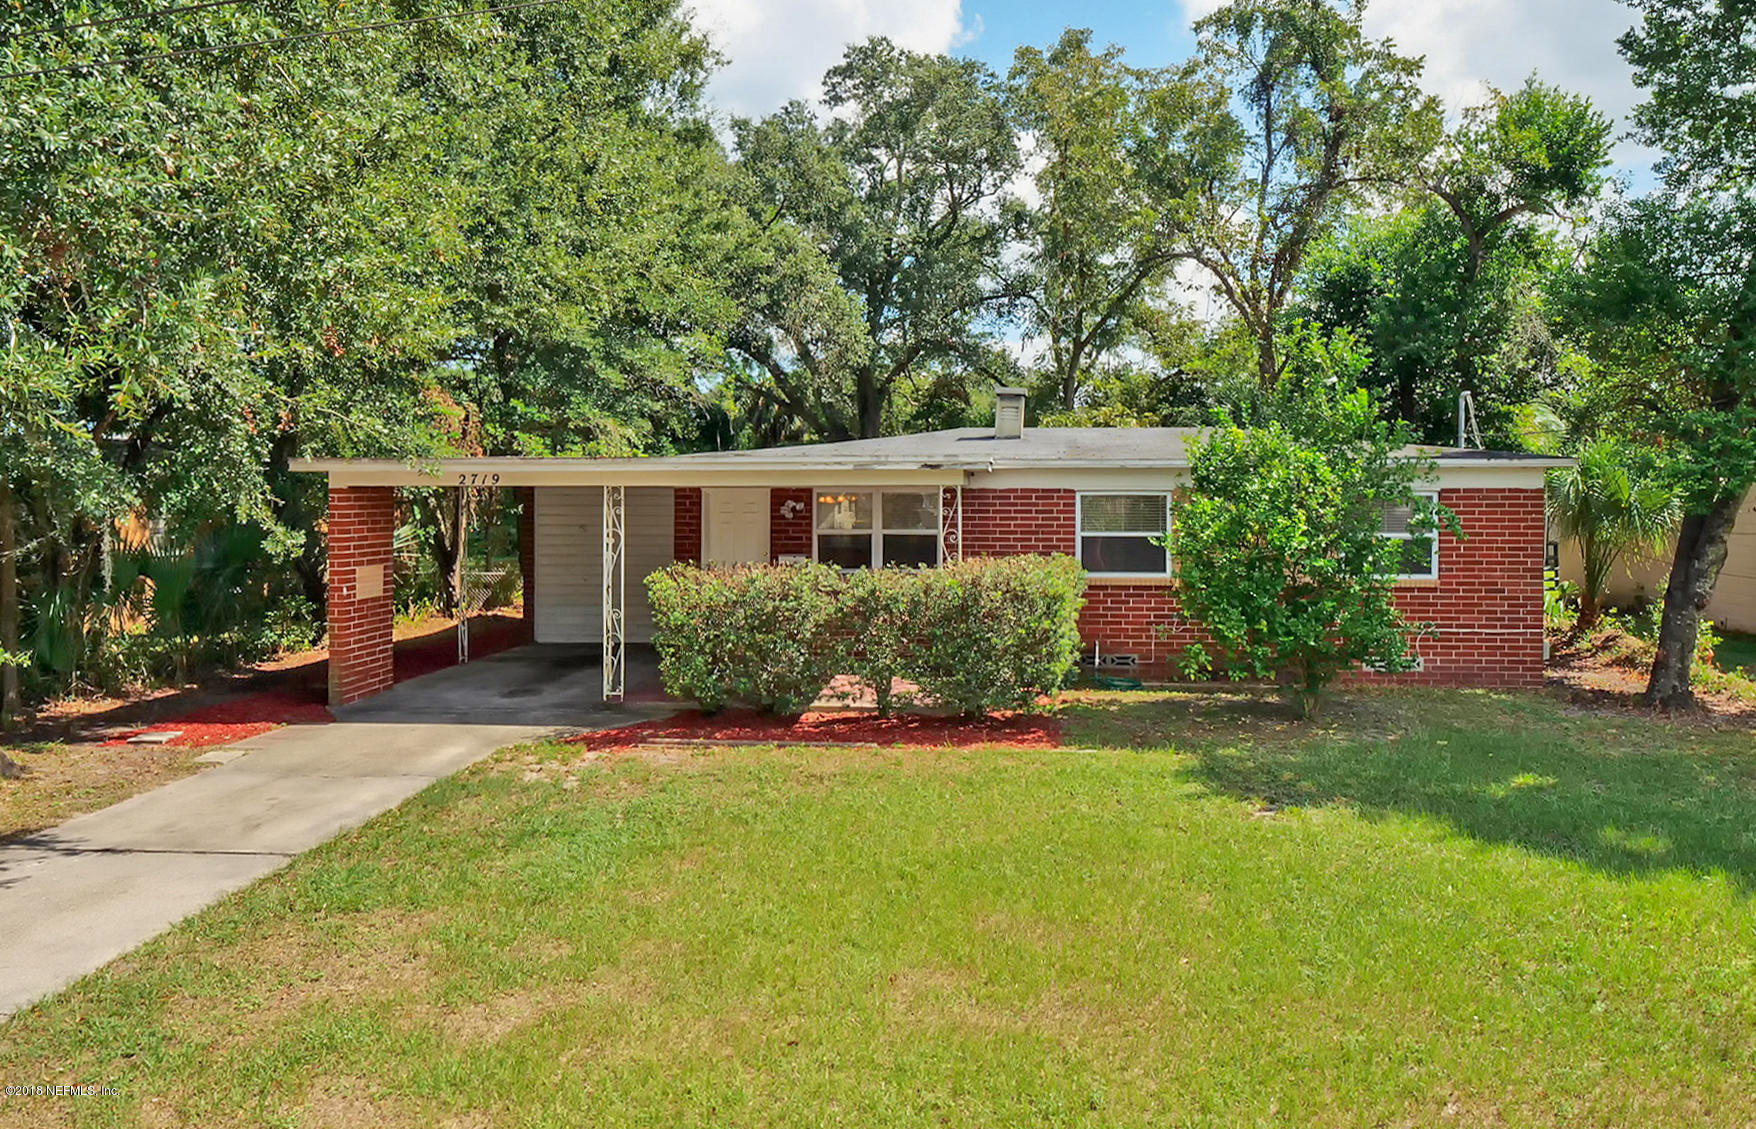 2719 HERRICK, JACKSONVILLE, FLORIDA 32211, 3 Bedrooms Bedrooms, ,1 BathroomBathrooms,Residential - single family,For sale,HERRICK,960568